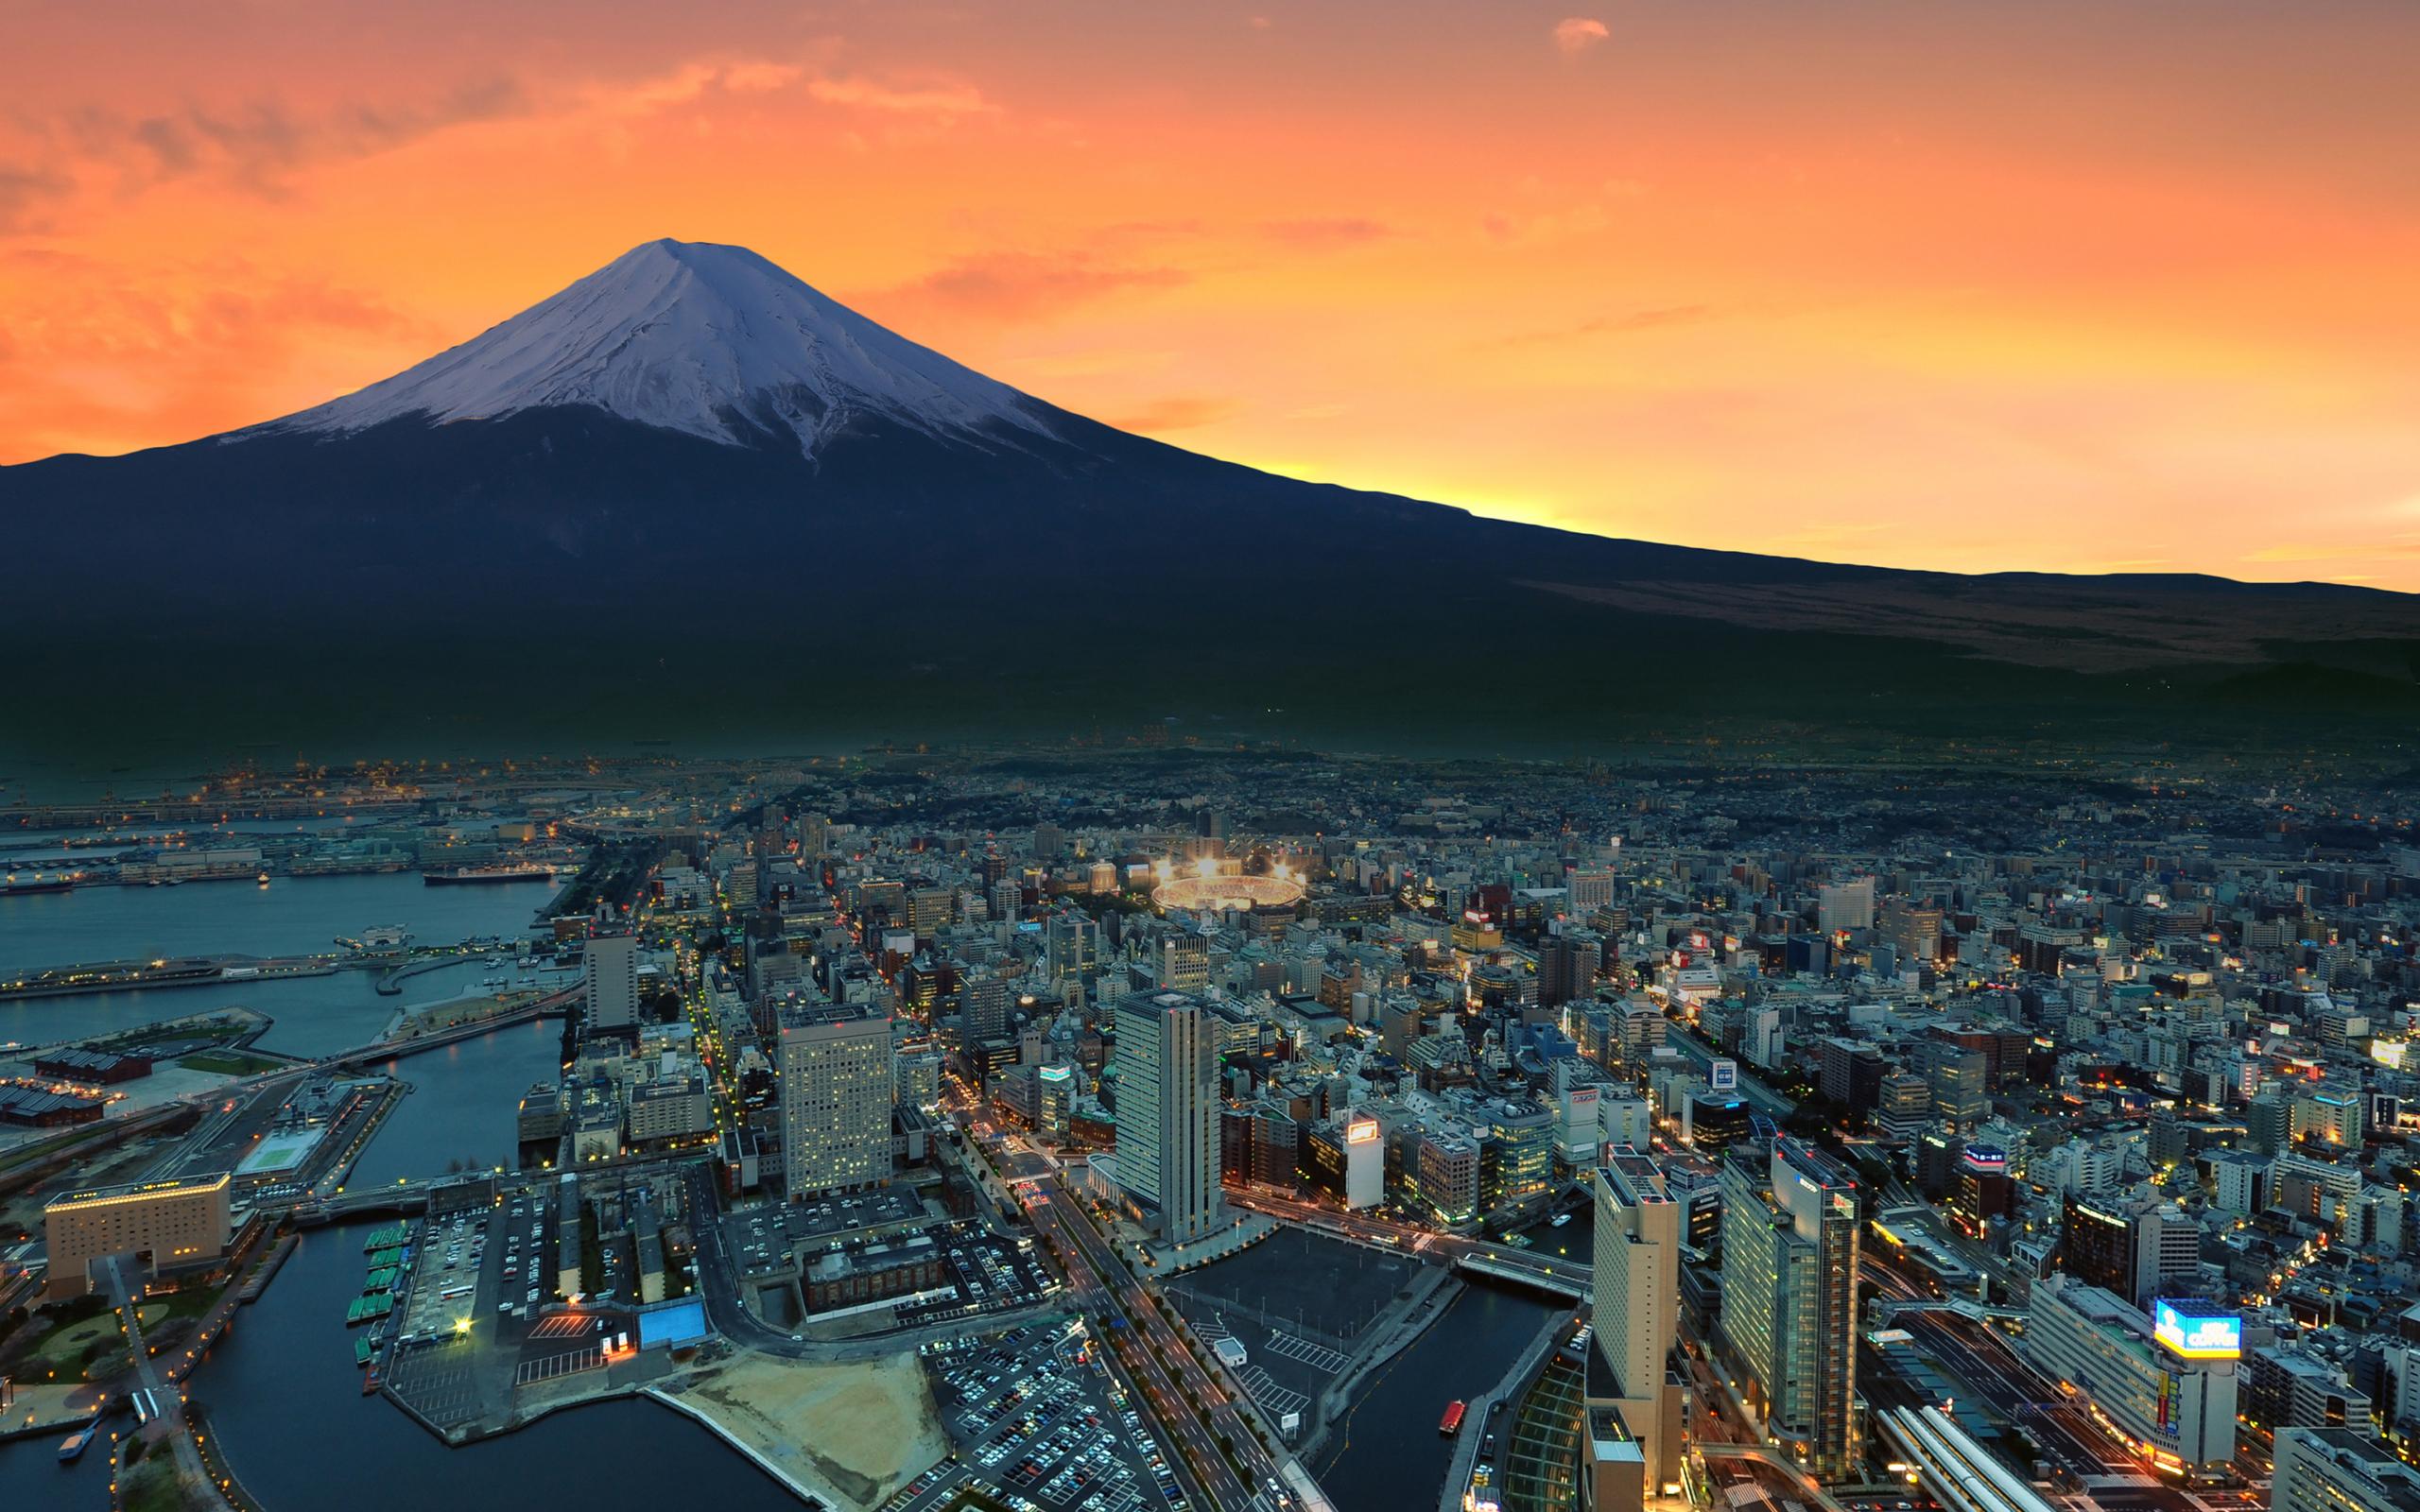 Mount Fuji Snowy Peak Japan Sunset City